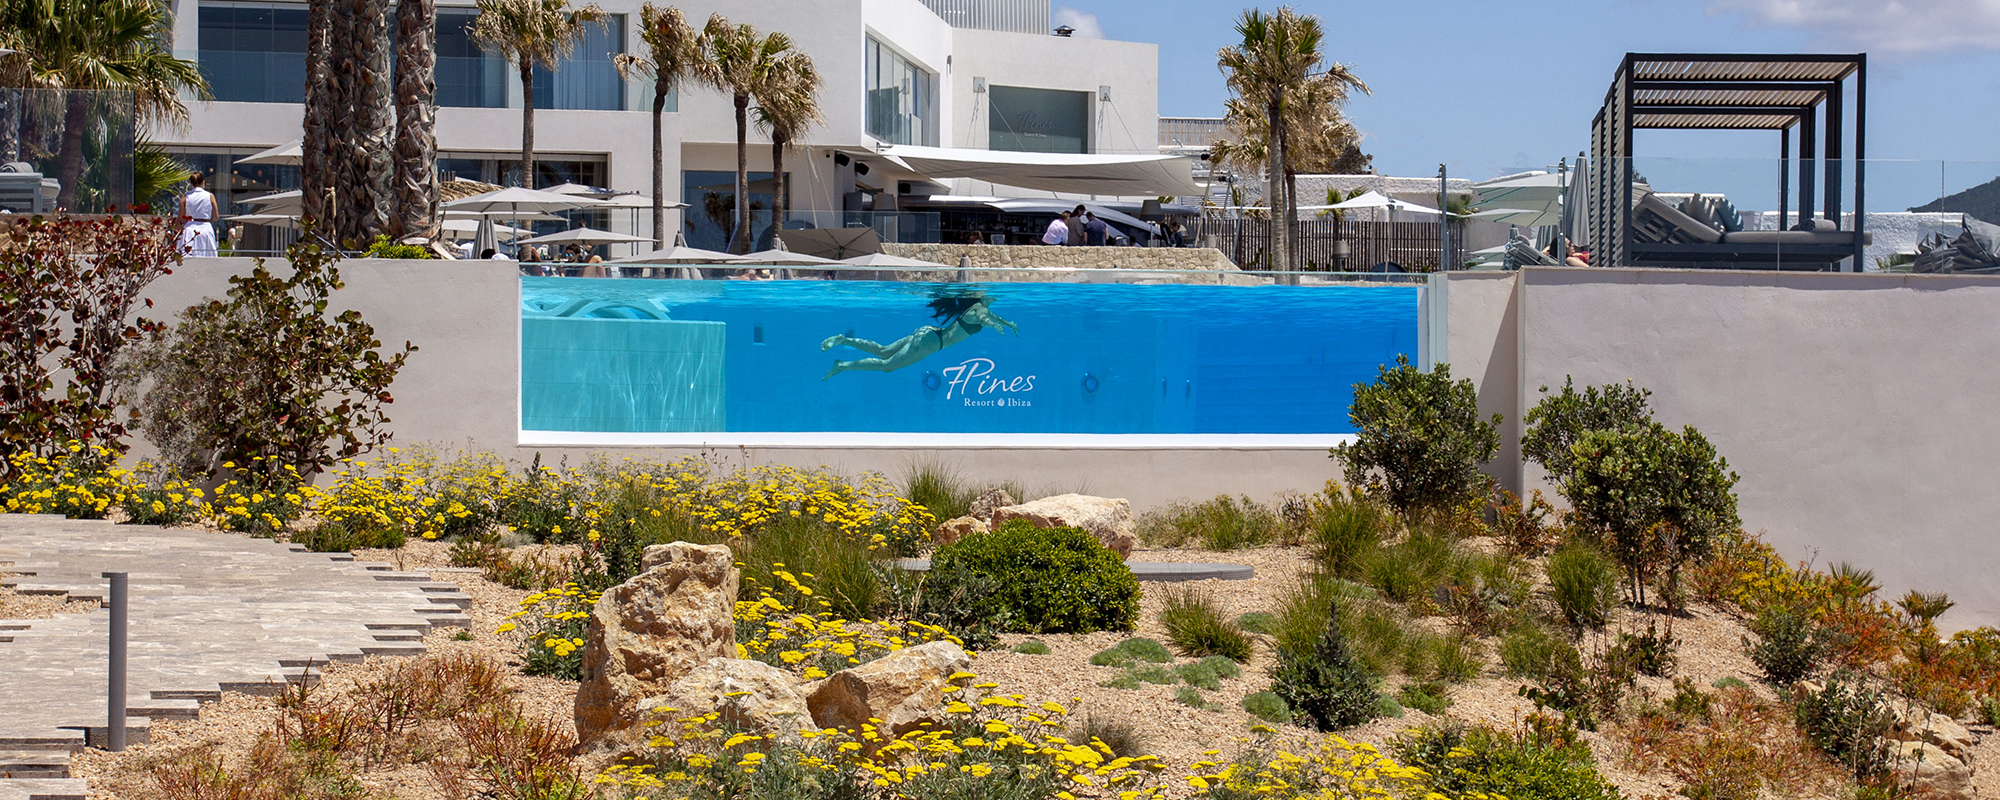 7 Pines Ibiza